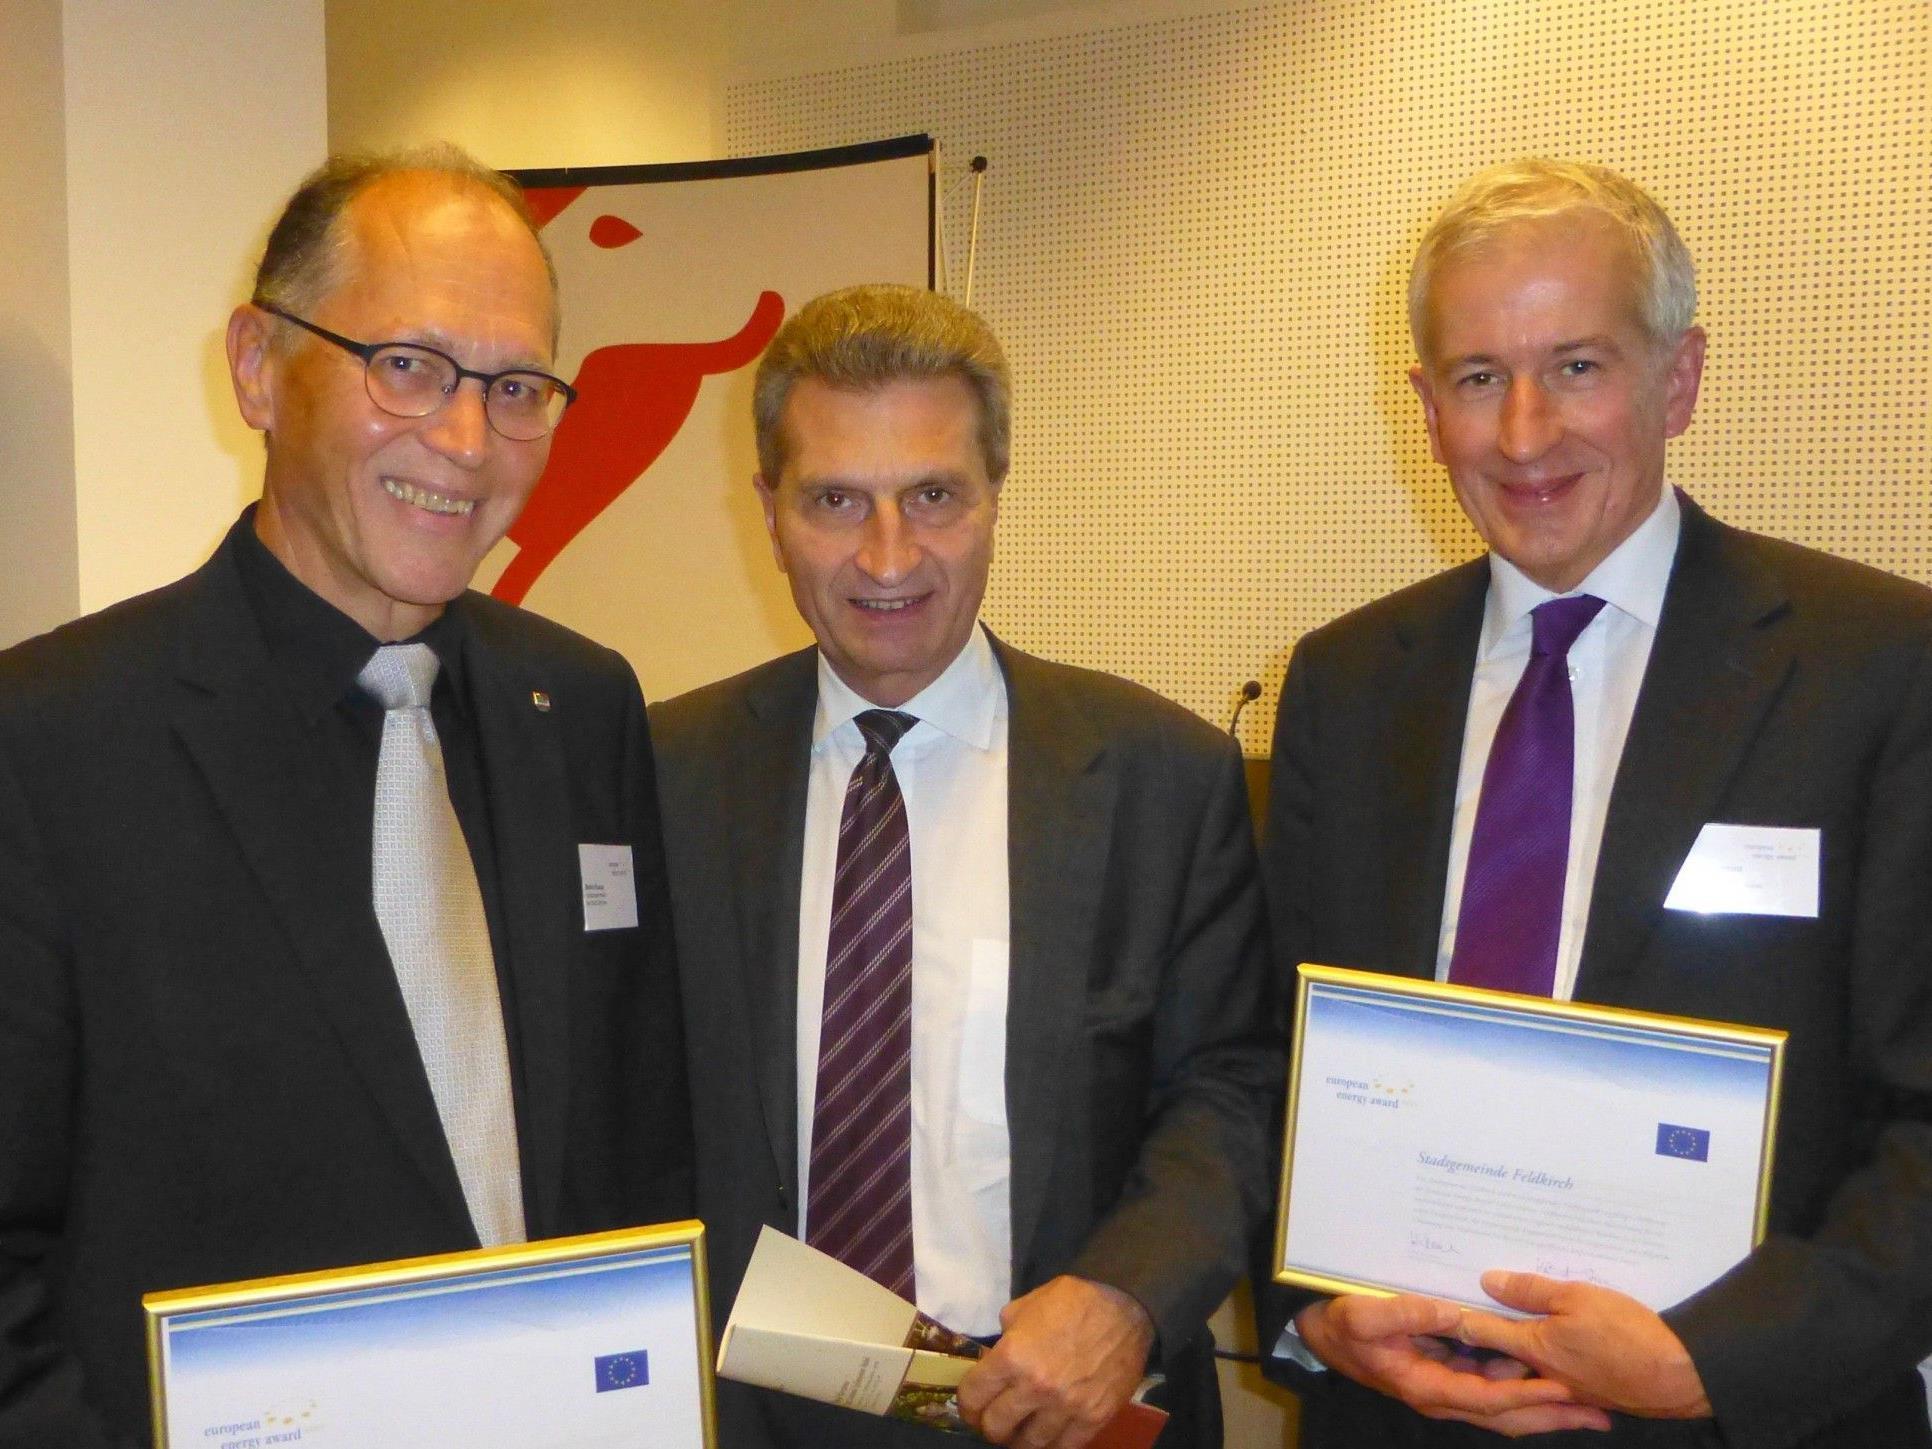 Stolz auf den European Energy Award in Gold: Dornbirns Vizebürgermeister Martin Ruepp (li) und Feldkirchs Bürgermeister Wilfried Berchtold (re) mit EU-Kommissar Günther Oettinger.